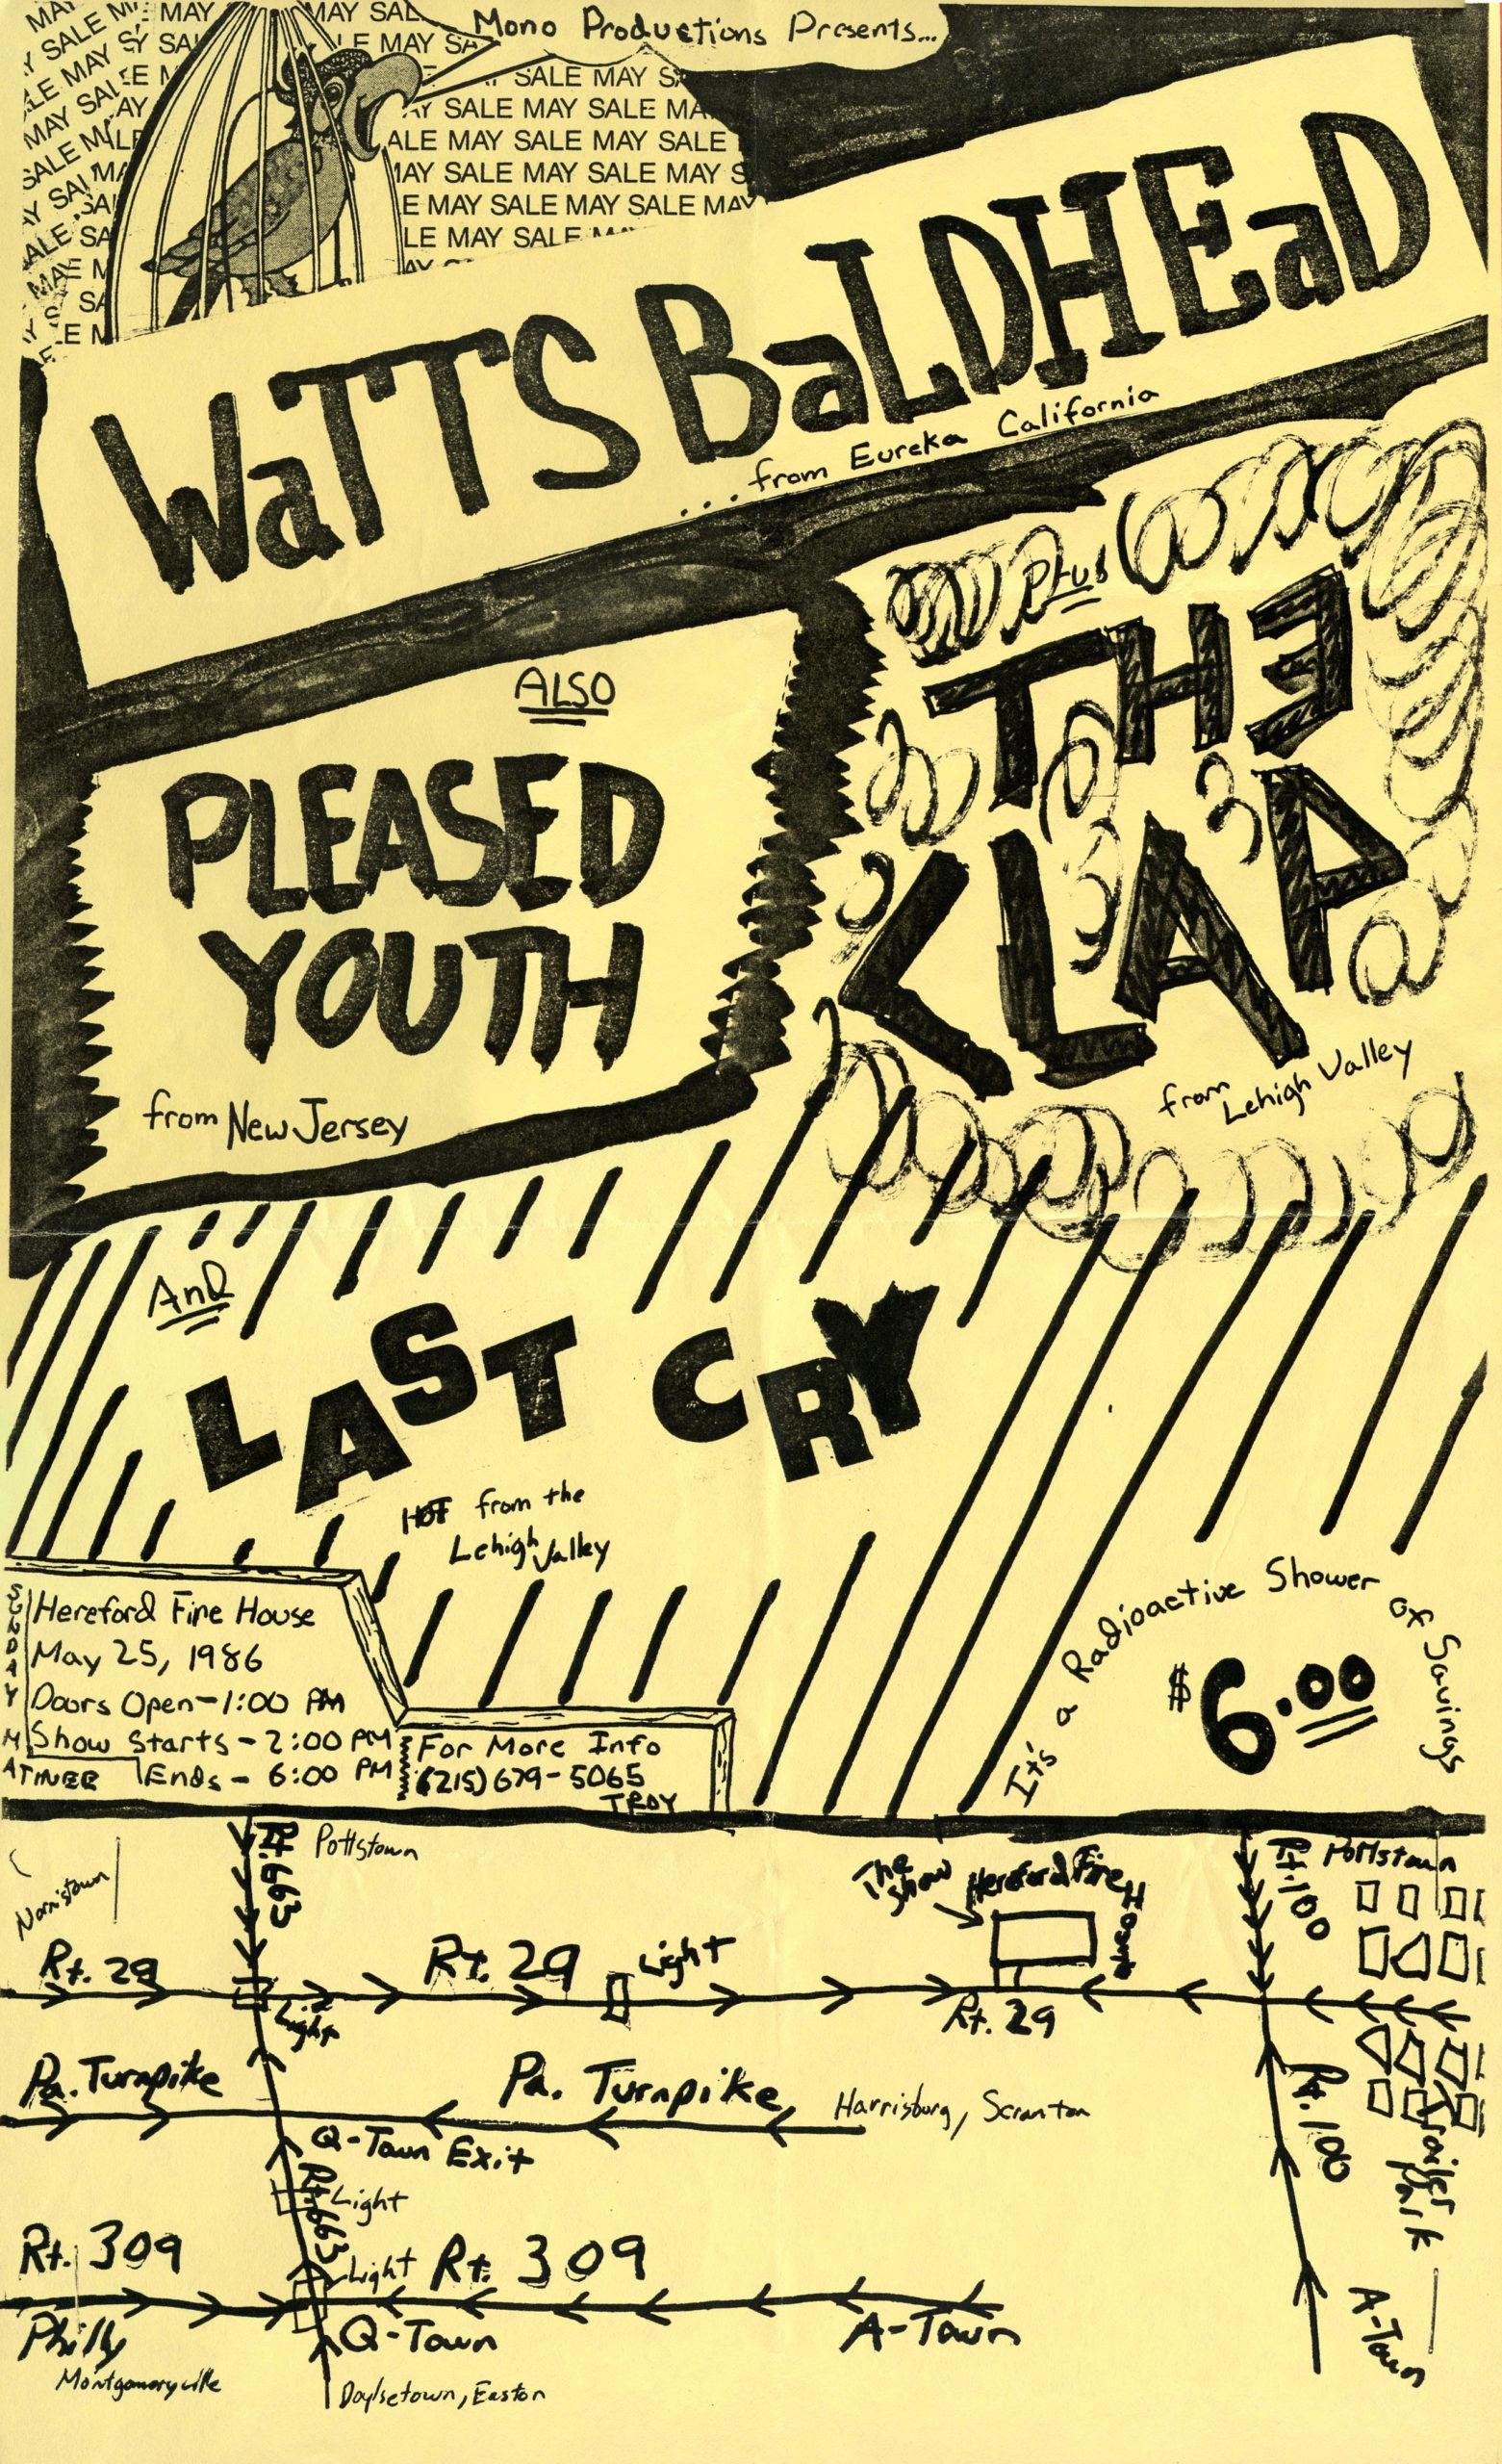 Flyer 3 – 5-25-86 show